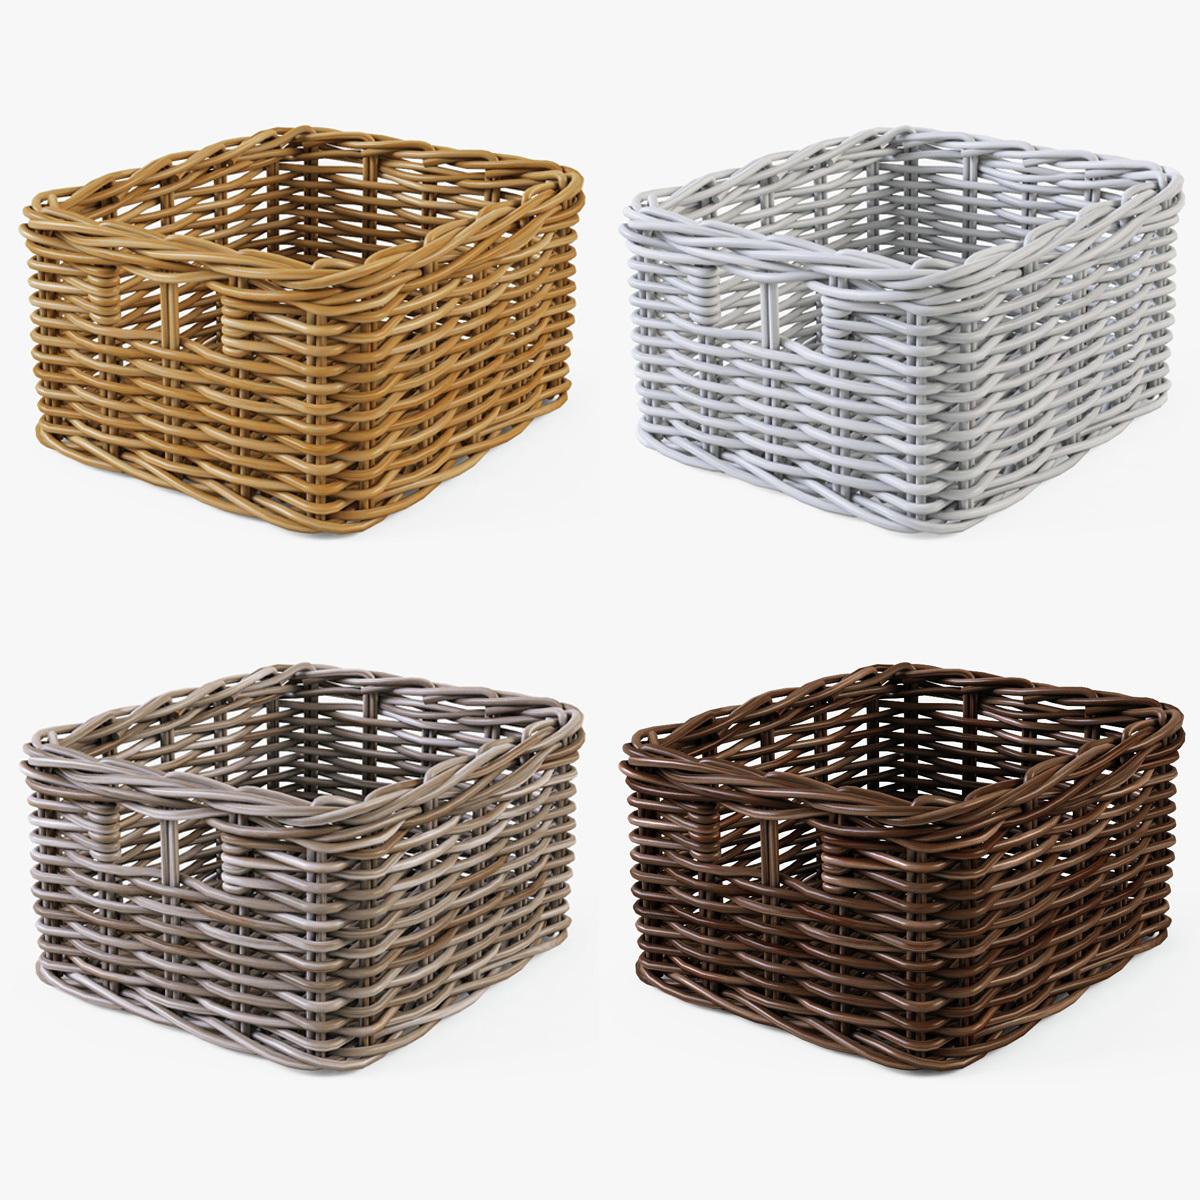 wicker basket ikea byholma 1 set 4 color by markelos 3docean. Black Bedroom Furniture Sets. Home Design Ideas